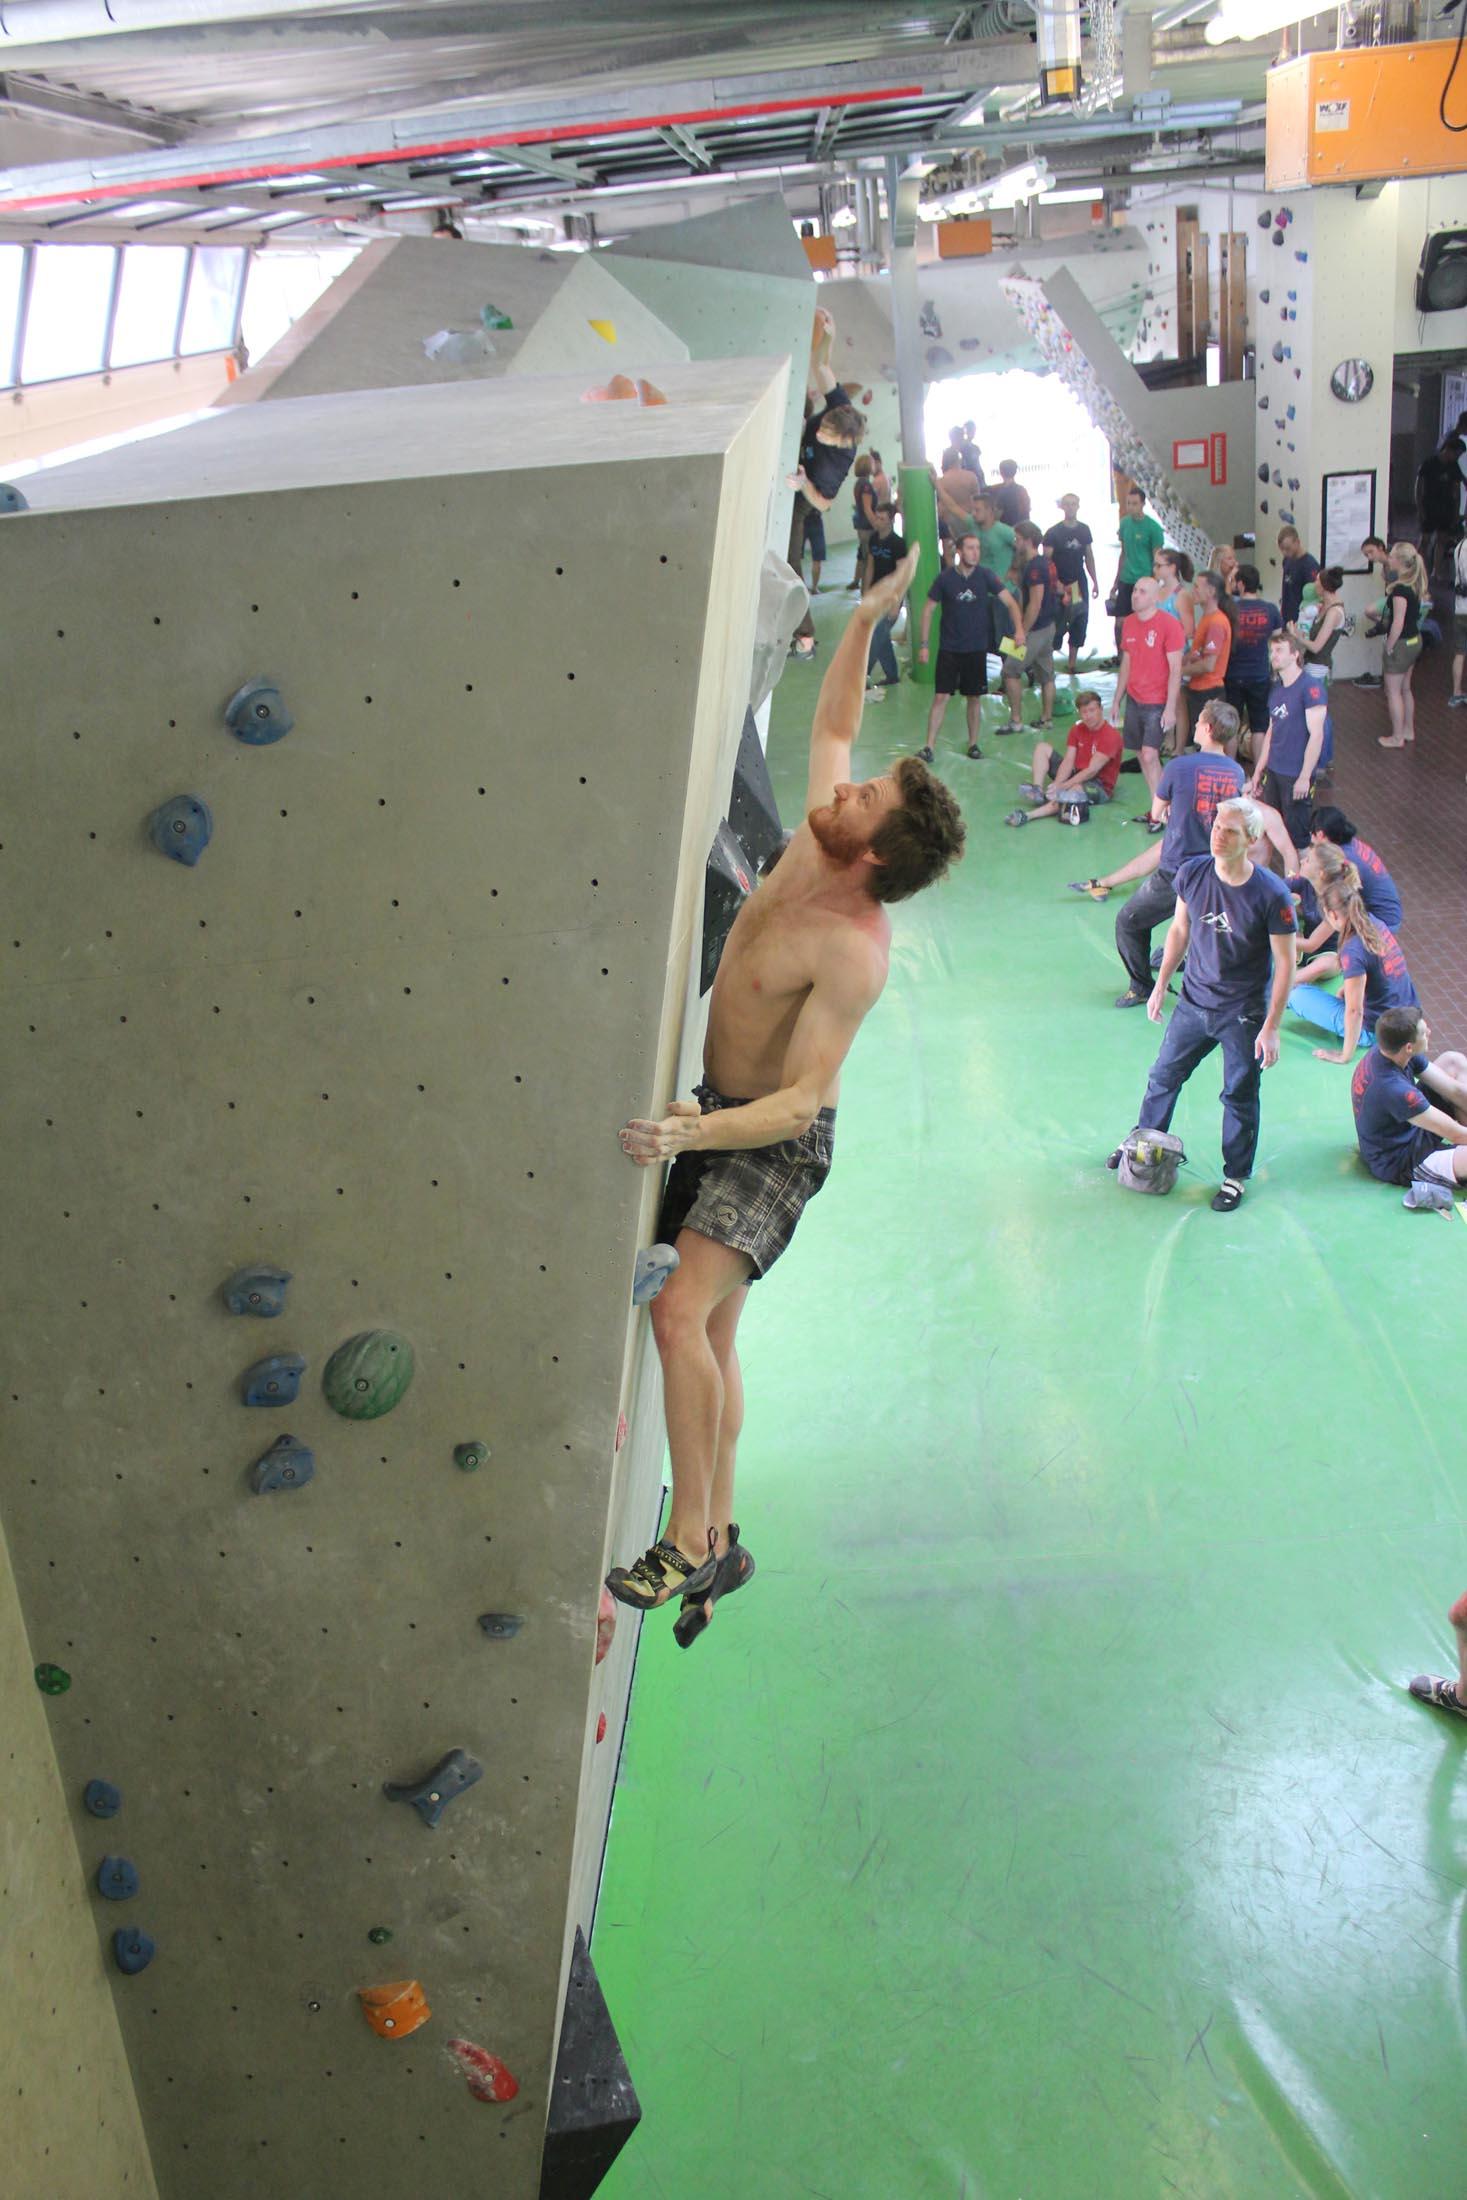 Quali, internationaler bouldercup Frankenjura 2016, BLOCKHELDEN Erlangen, Mammut, Bergfreunde.de, Boulderwettkampf07092016136